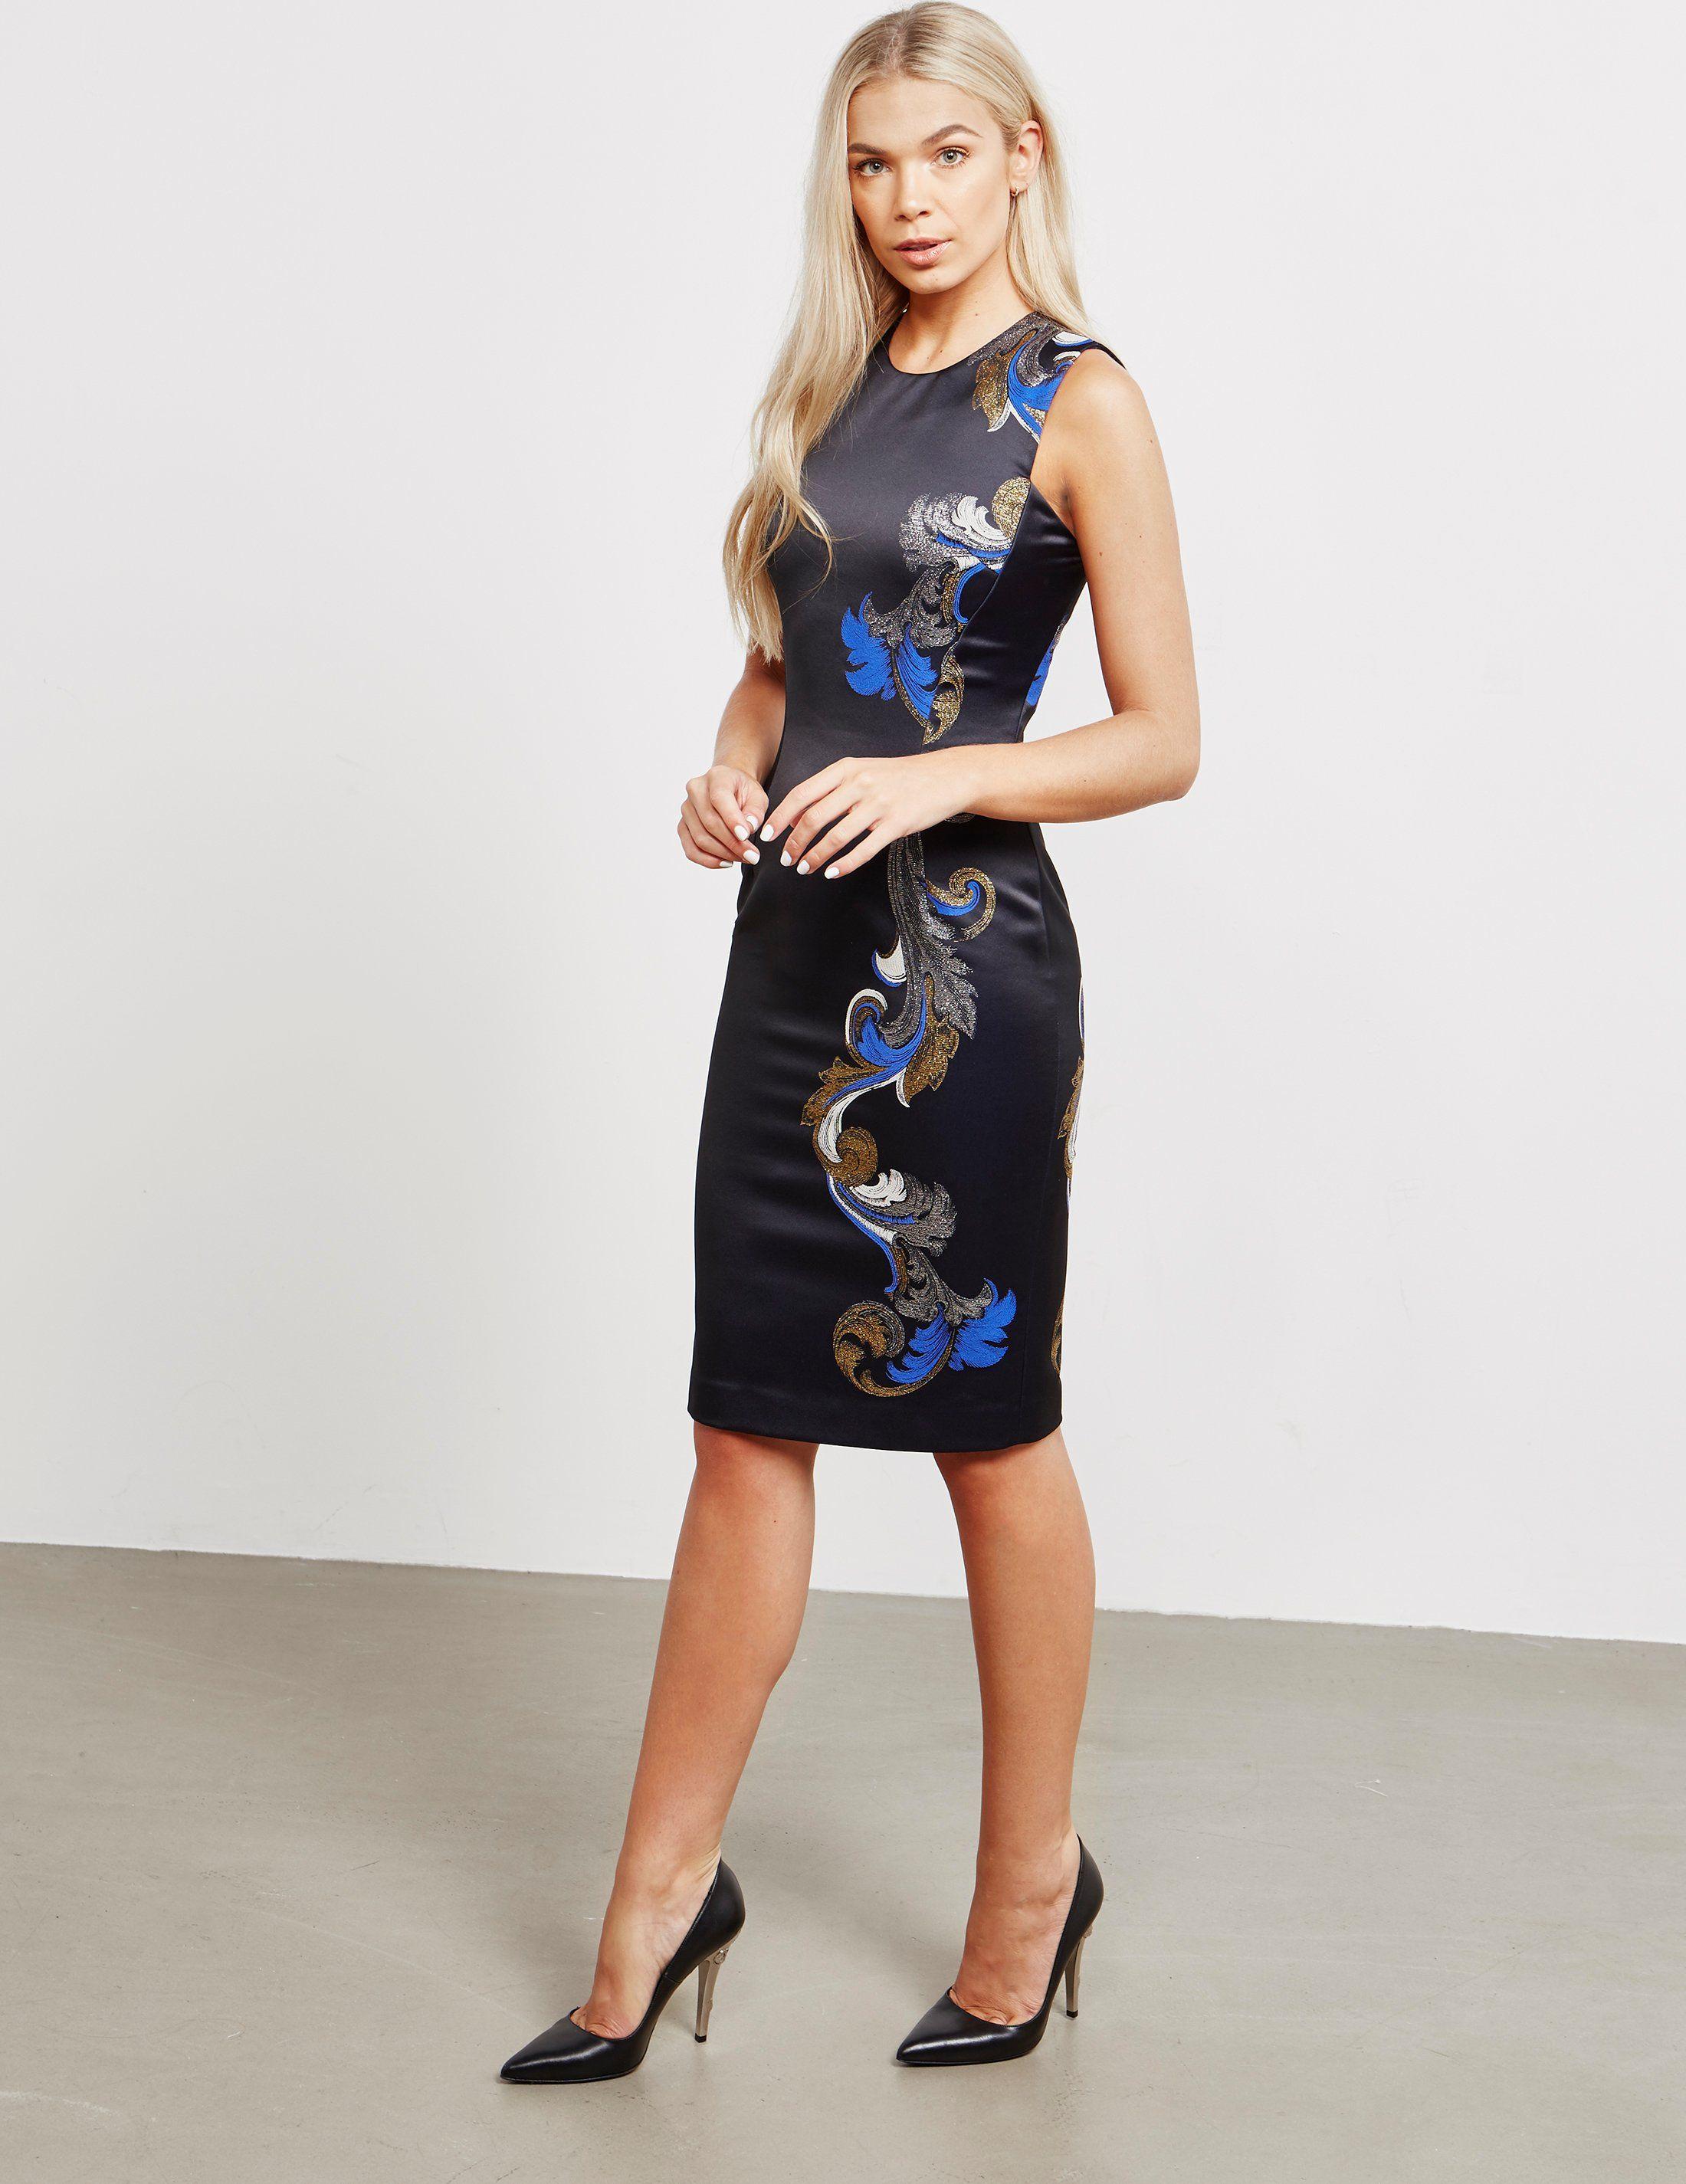 Versace Print Detail Dress - Online Exclusive